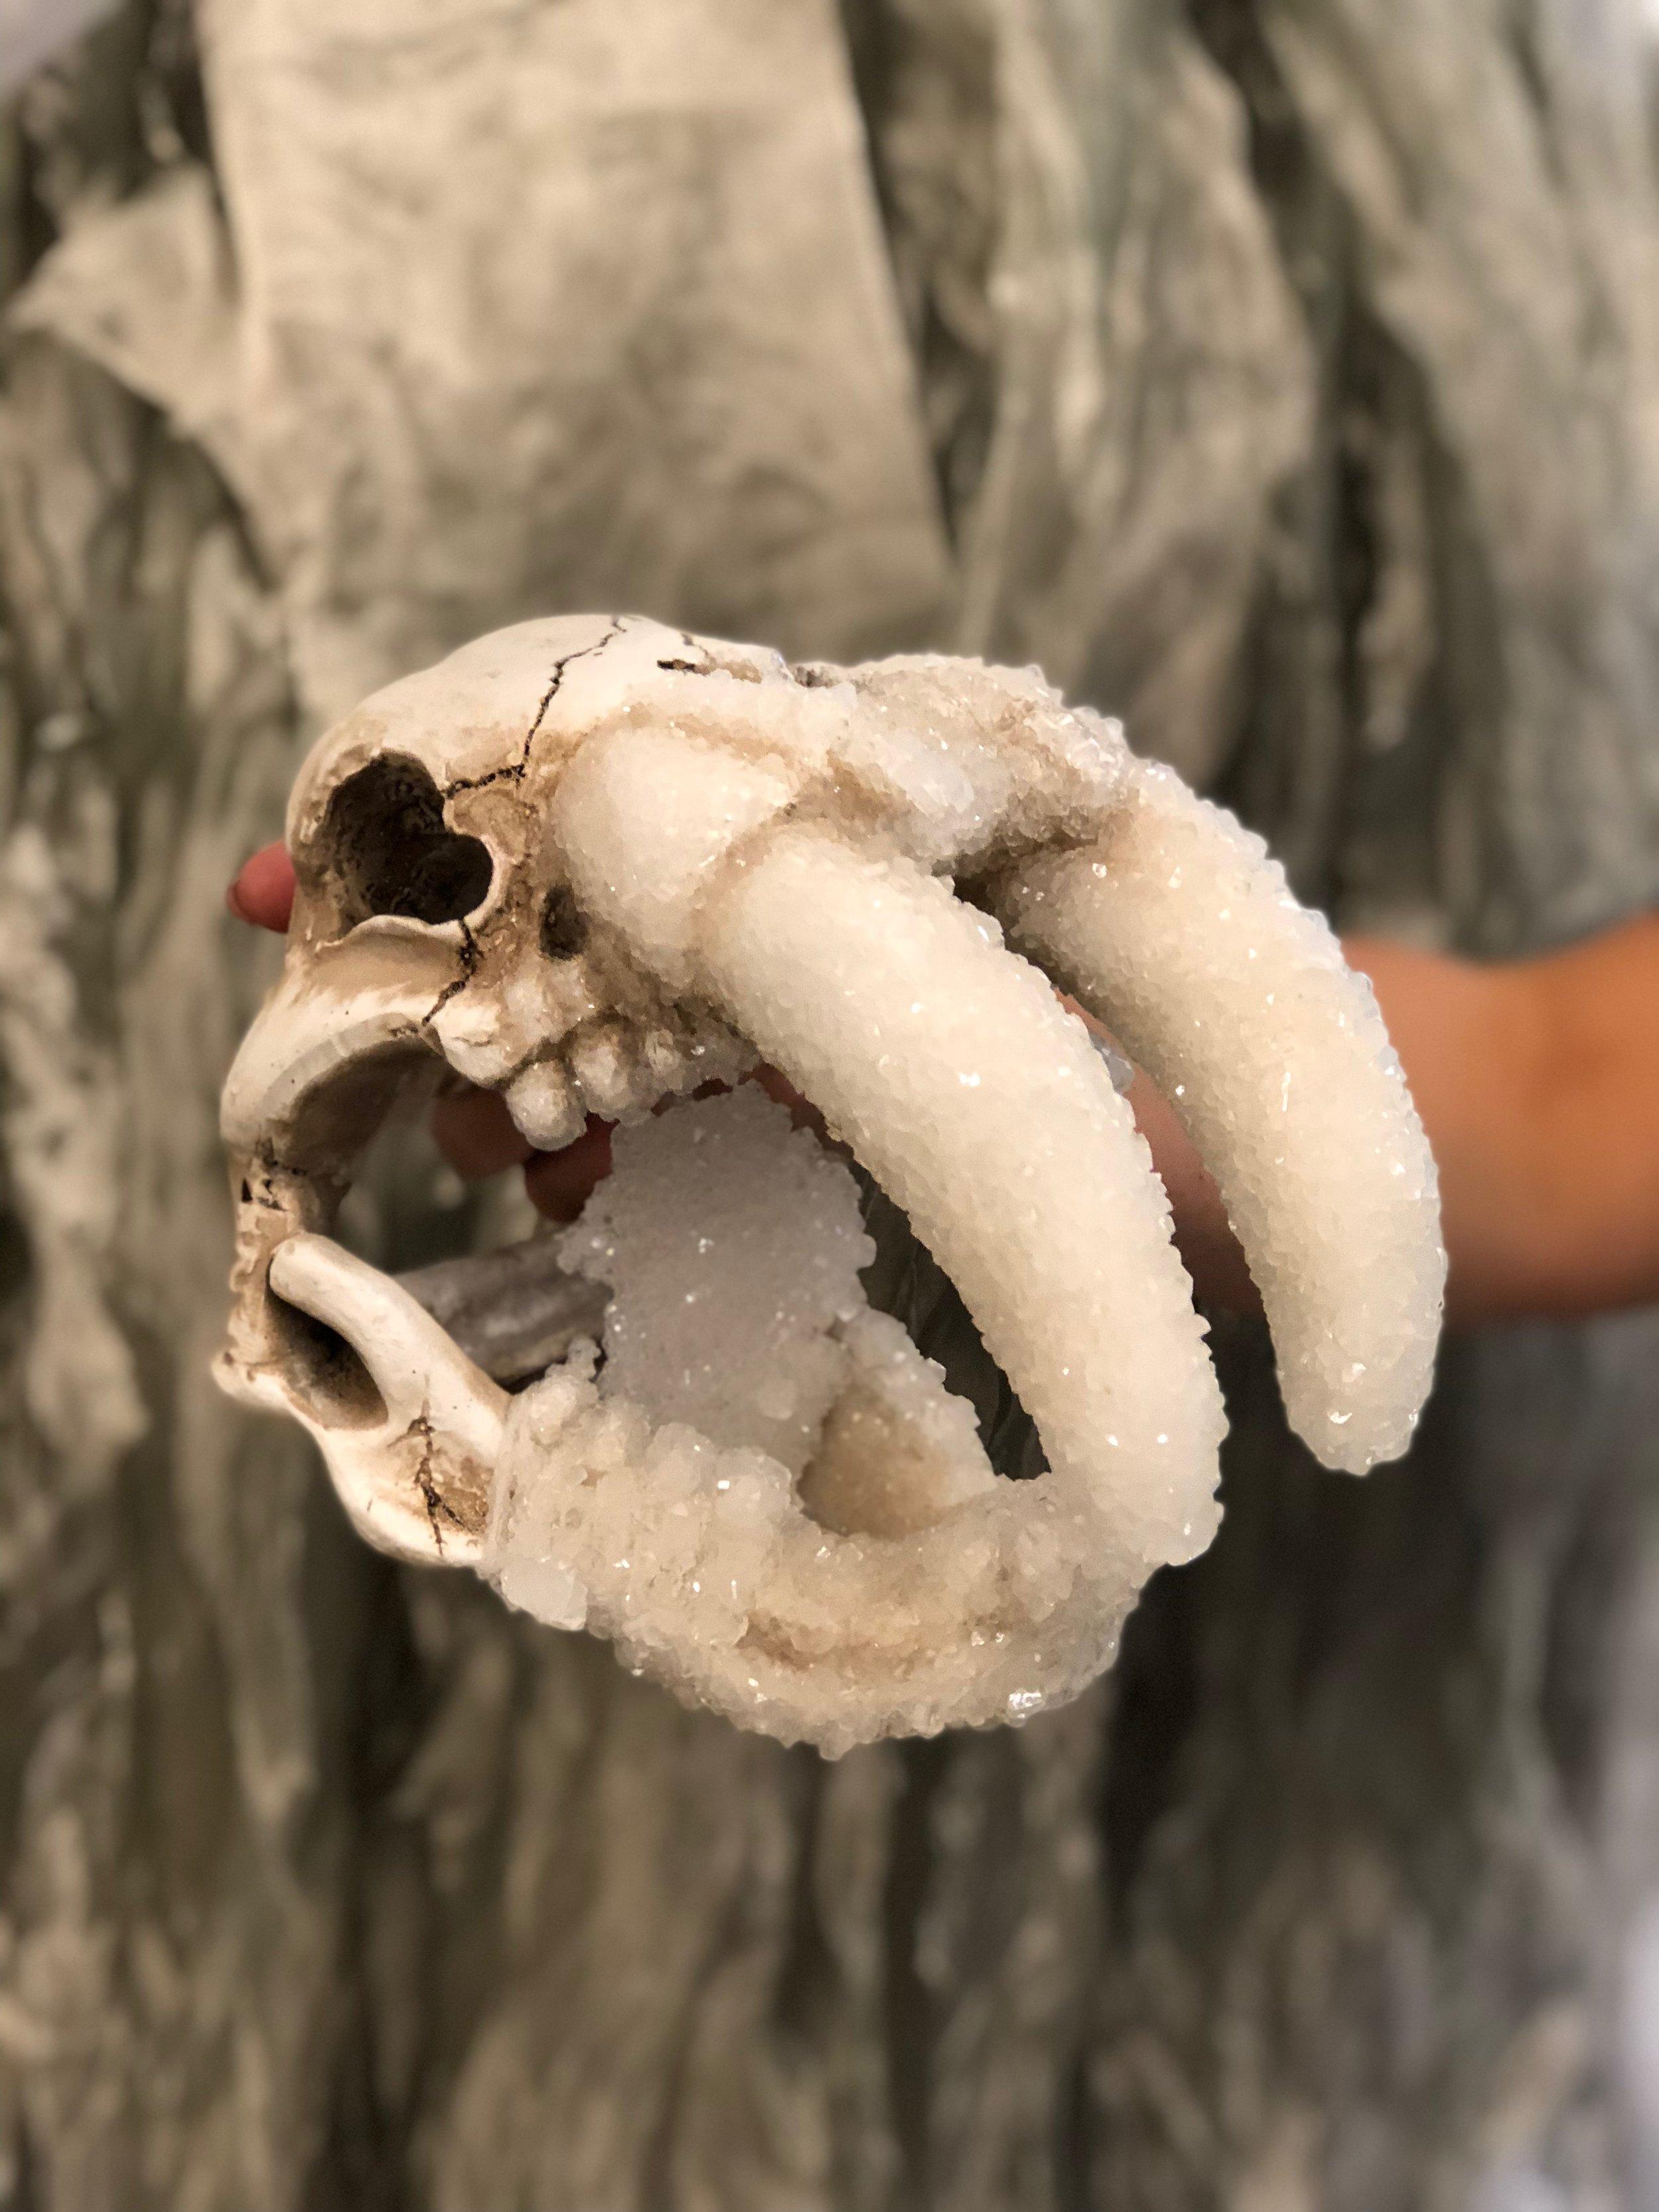 Crystal Growth : Walrus Skull (Natura Obscura)